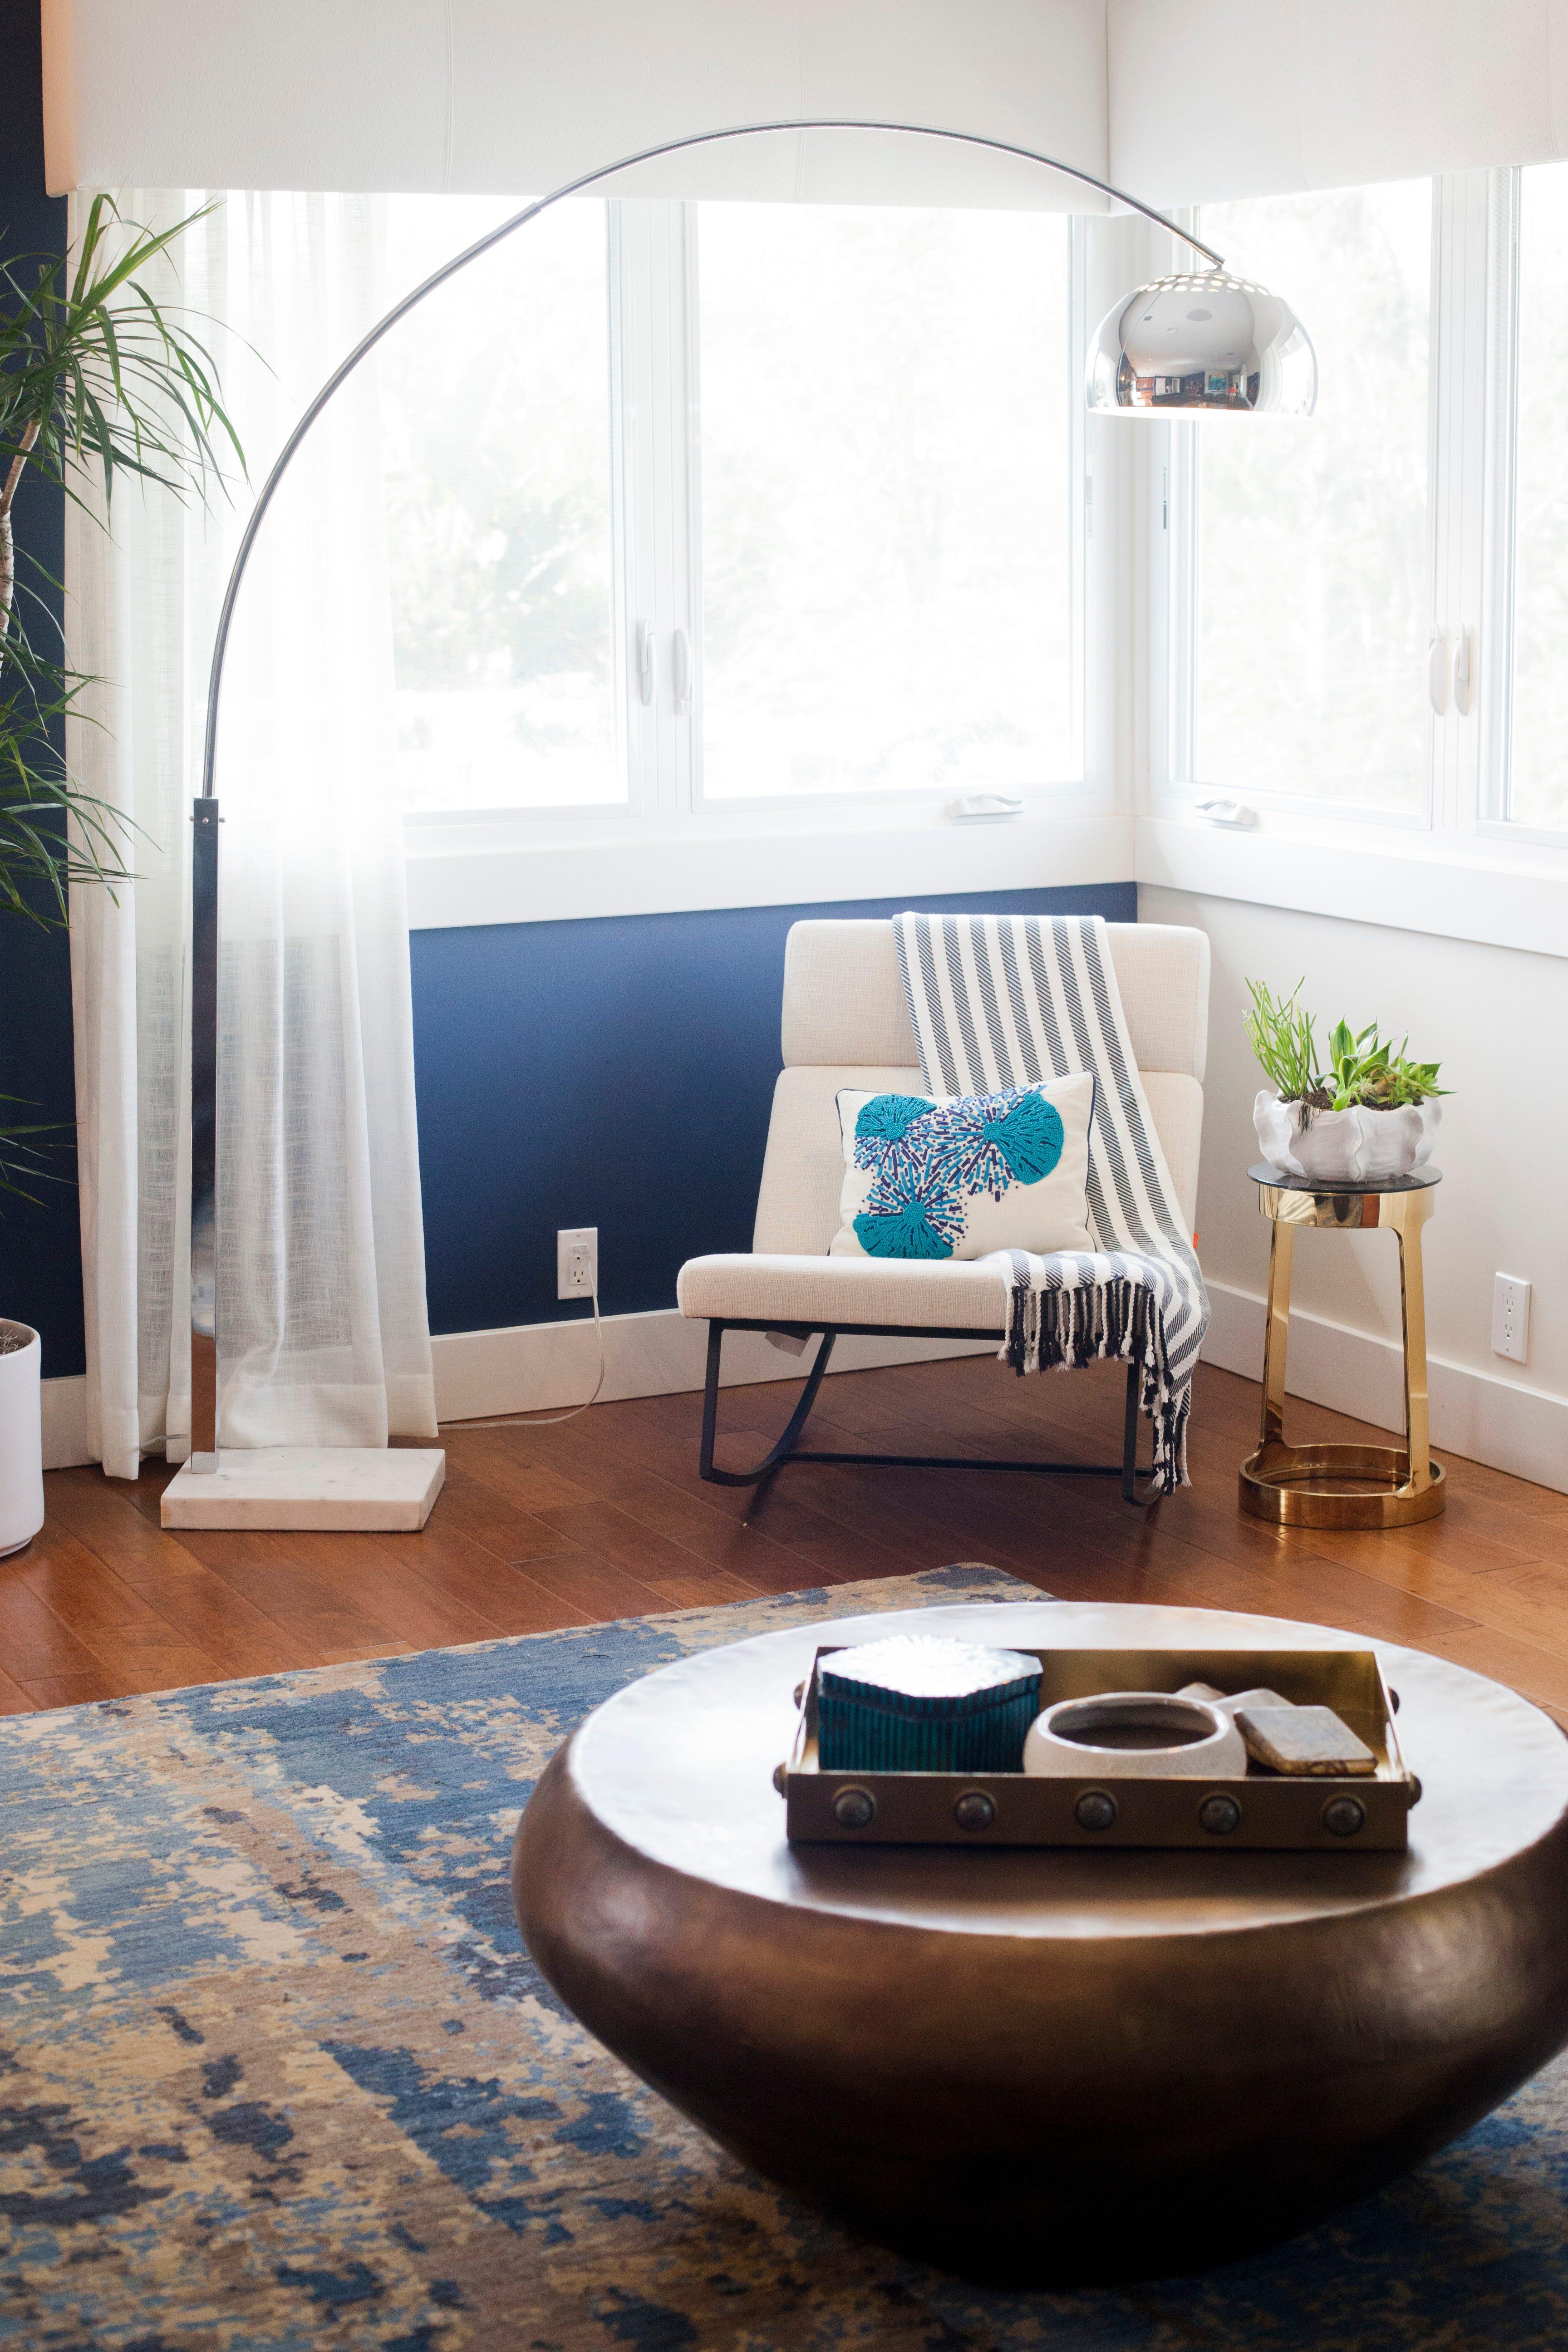 Cheap Home Decor Items